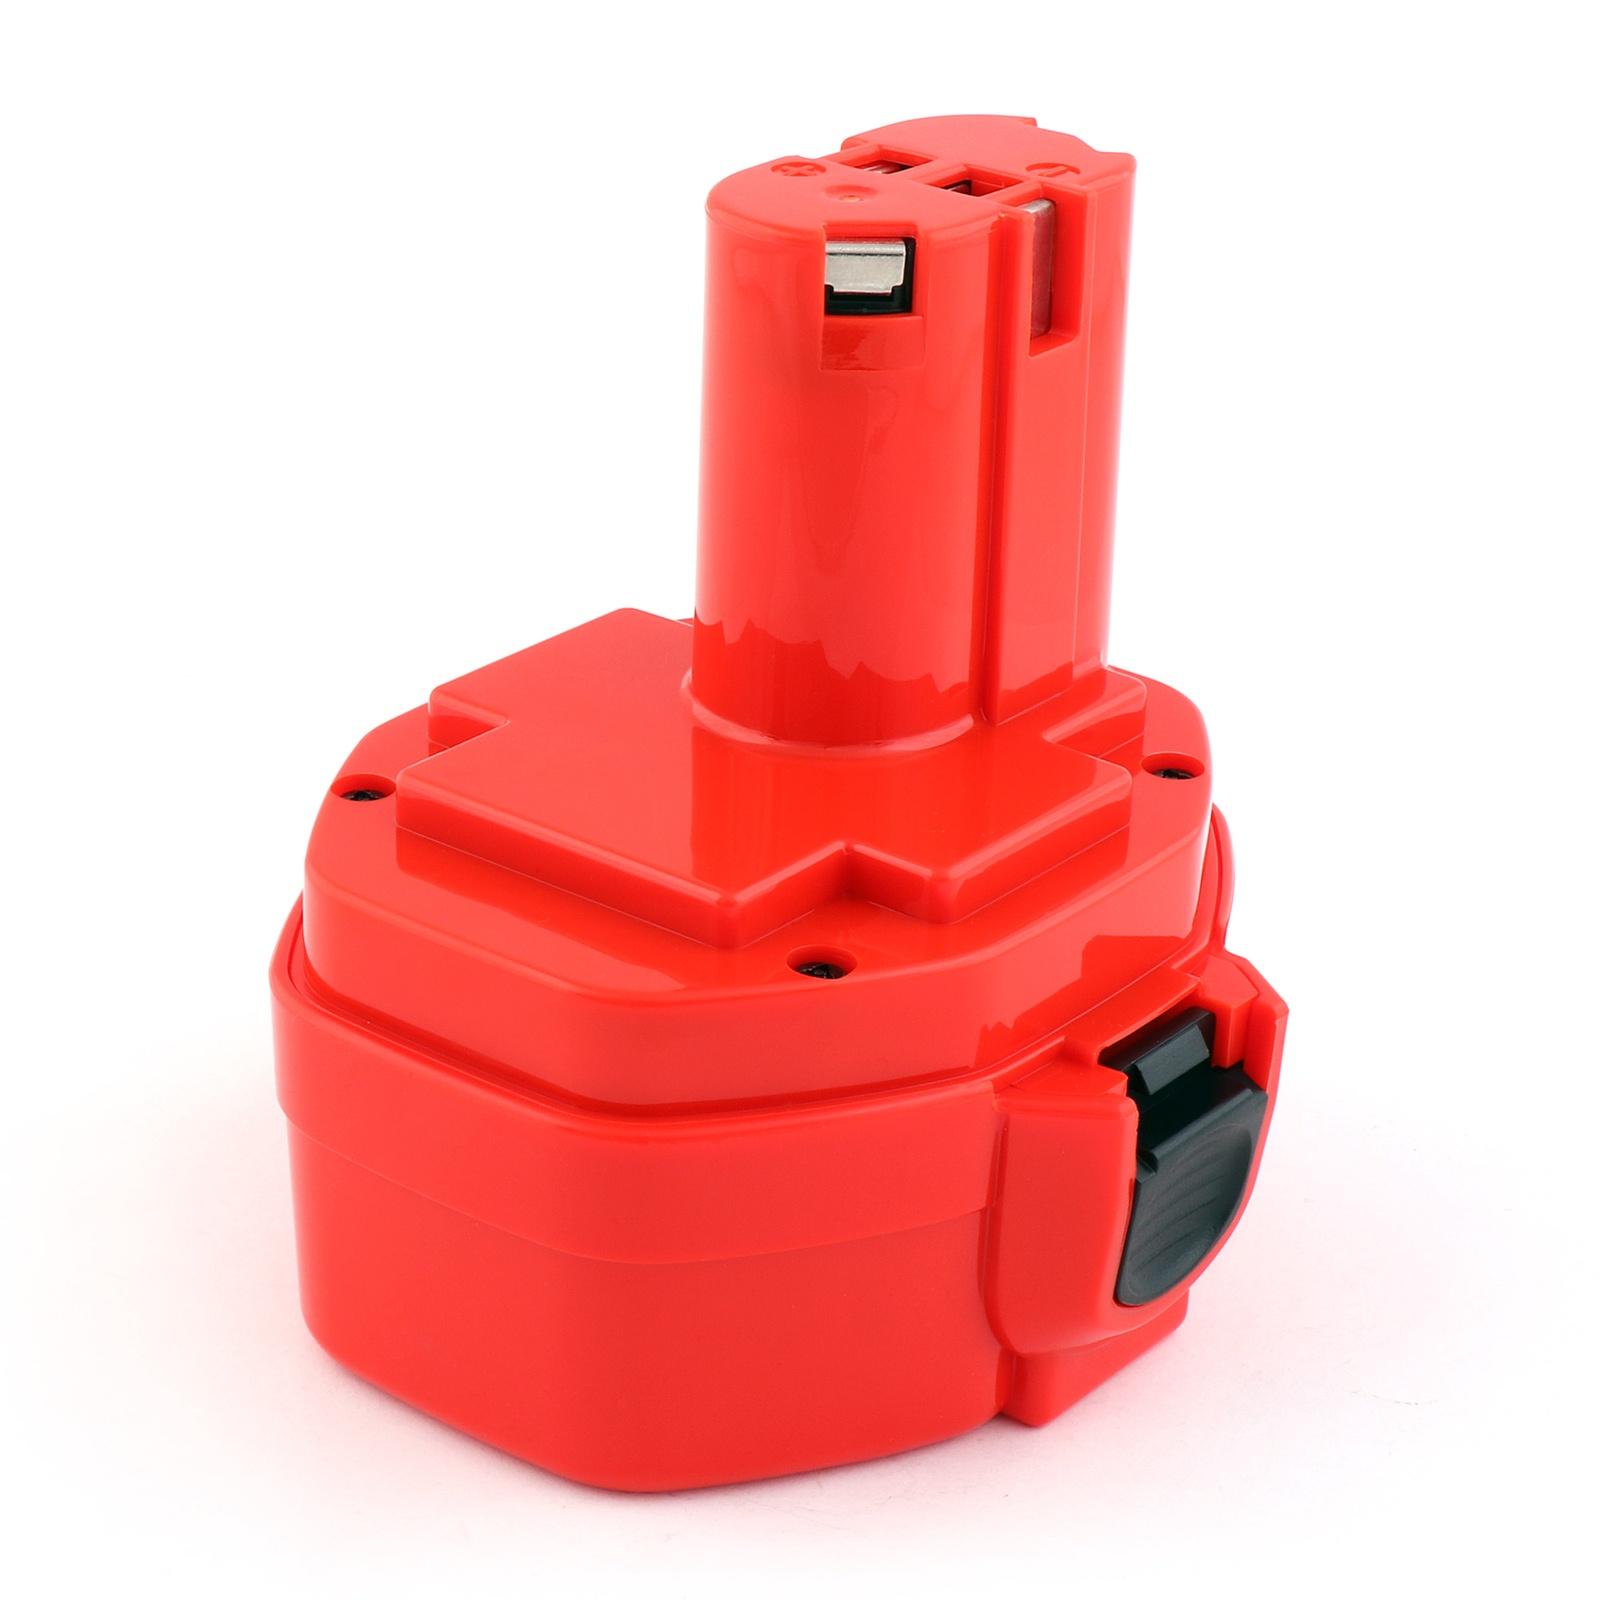 Аккумулятор для инструмента TopON TOP-PTGD-MAK-14.4-1.3 lumintop 920 lumen flashlight sd4a searching light cree xp l hi powerful led flashlight max beam 285 meters 8 modes